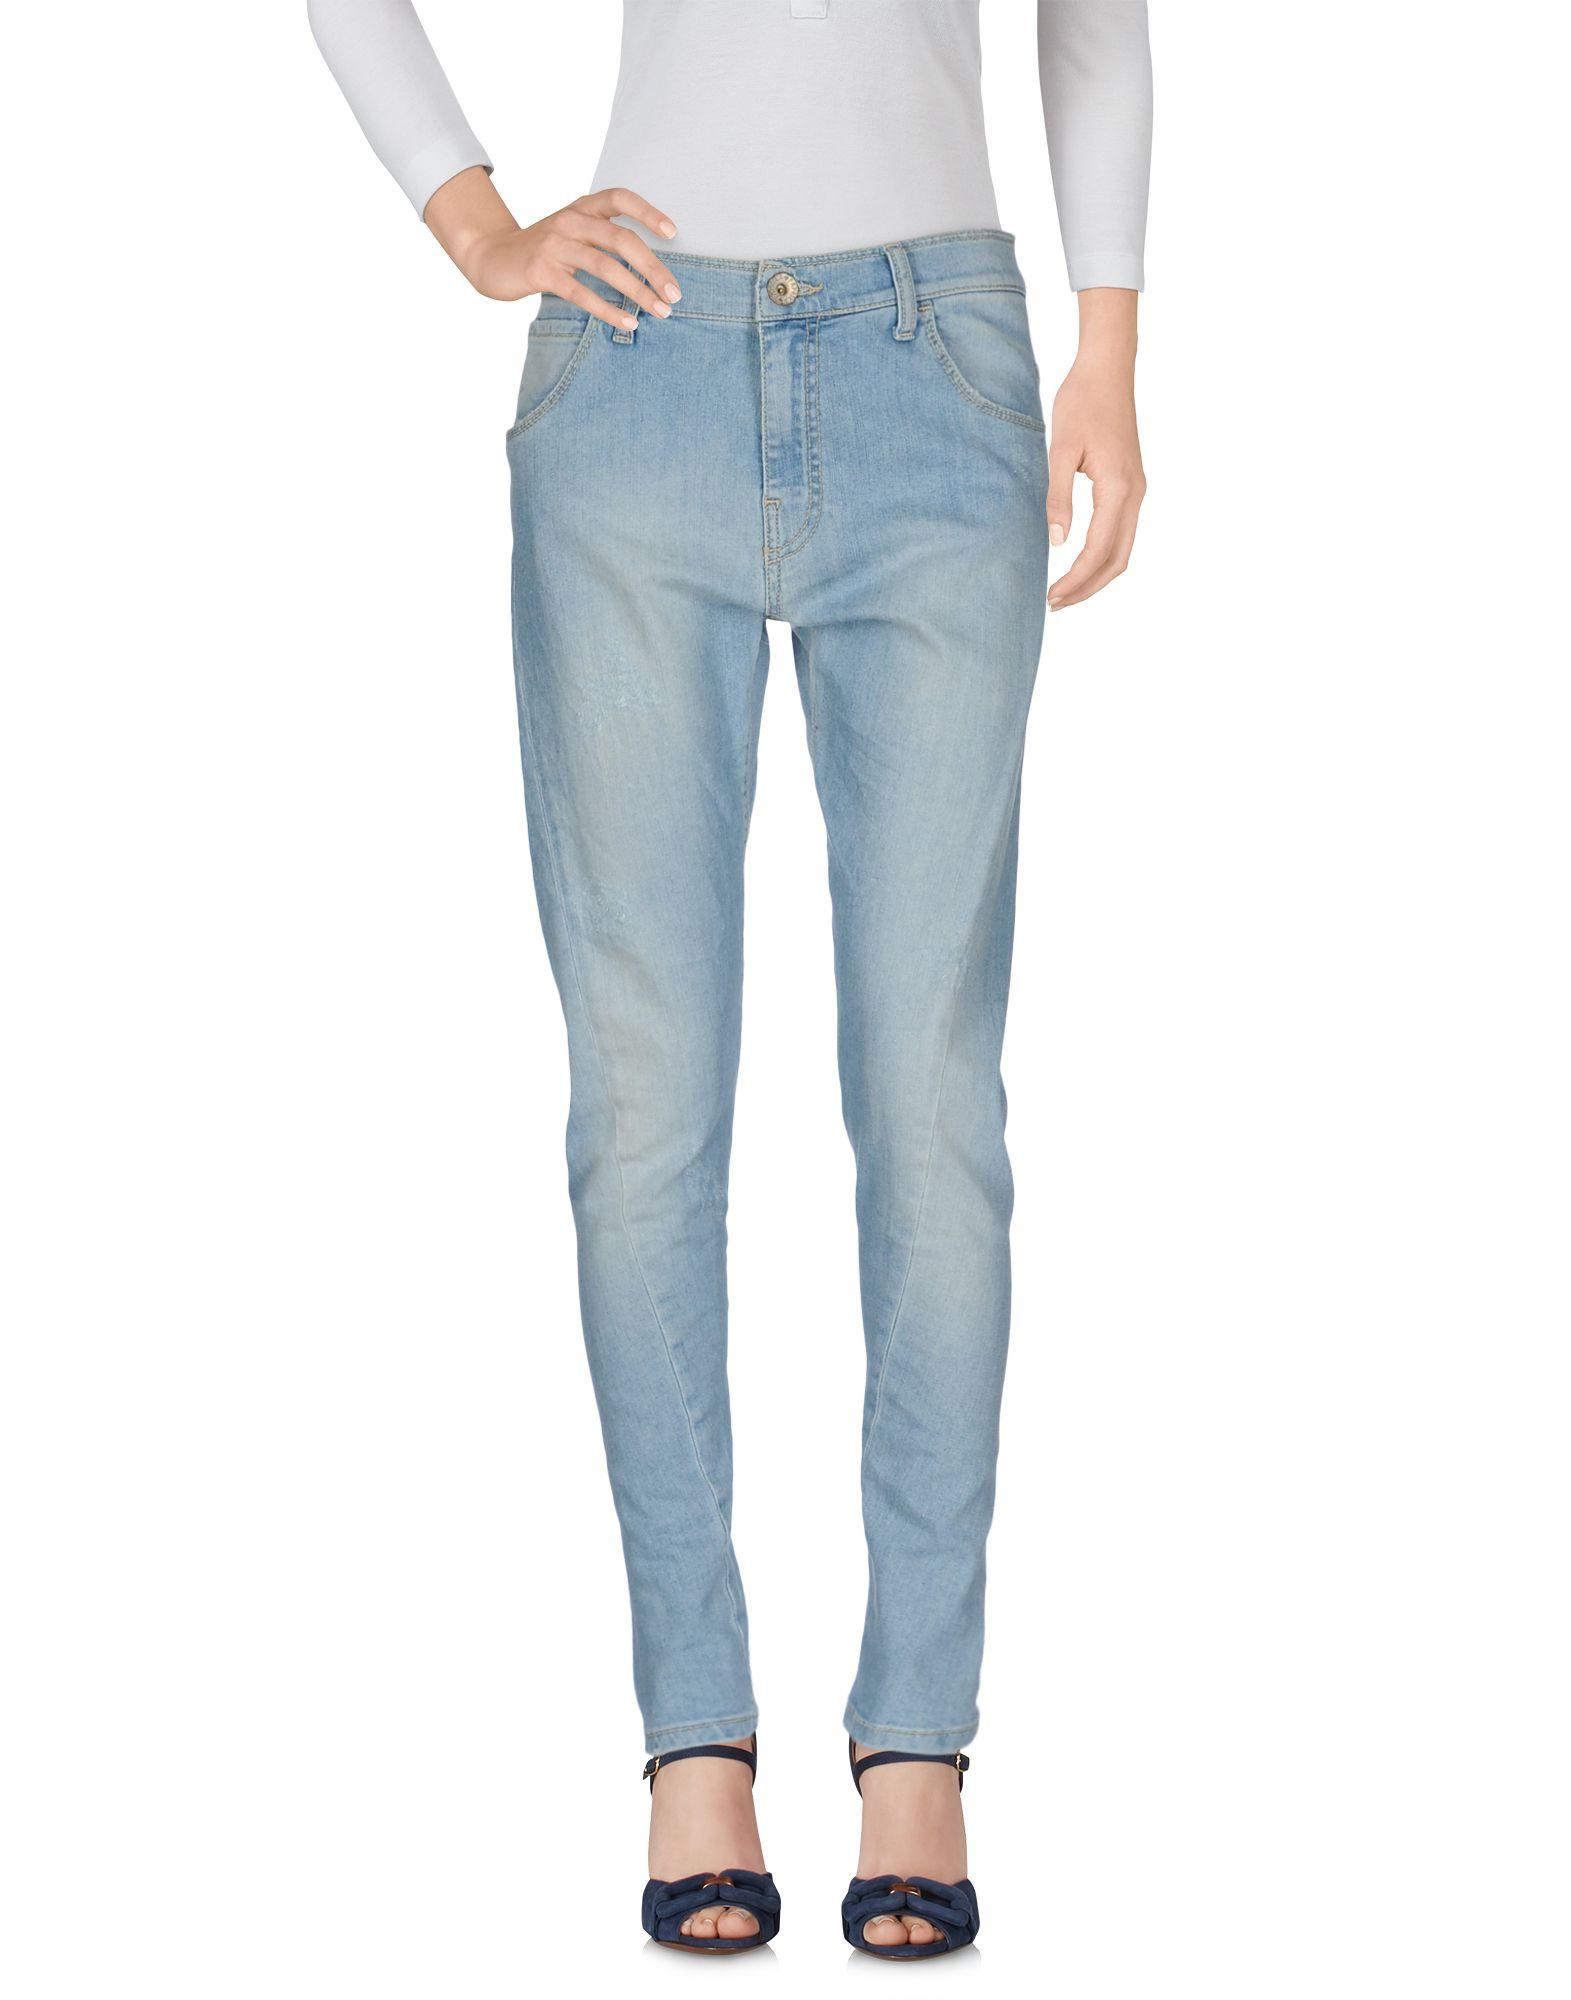 P by PAPRIKA Damen Jeanshose Farbe Blau Größe 2 jetztbilligerkaufen